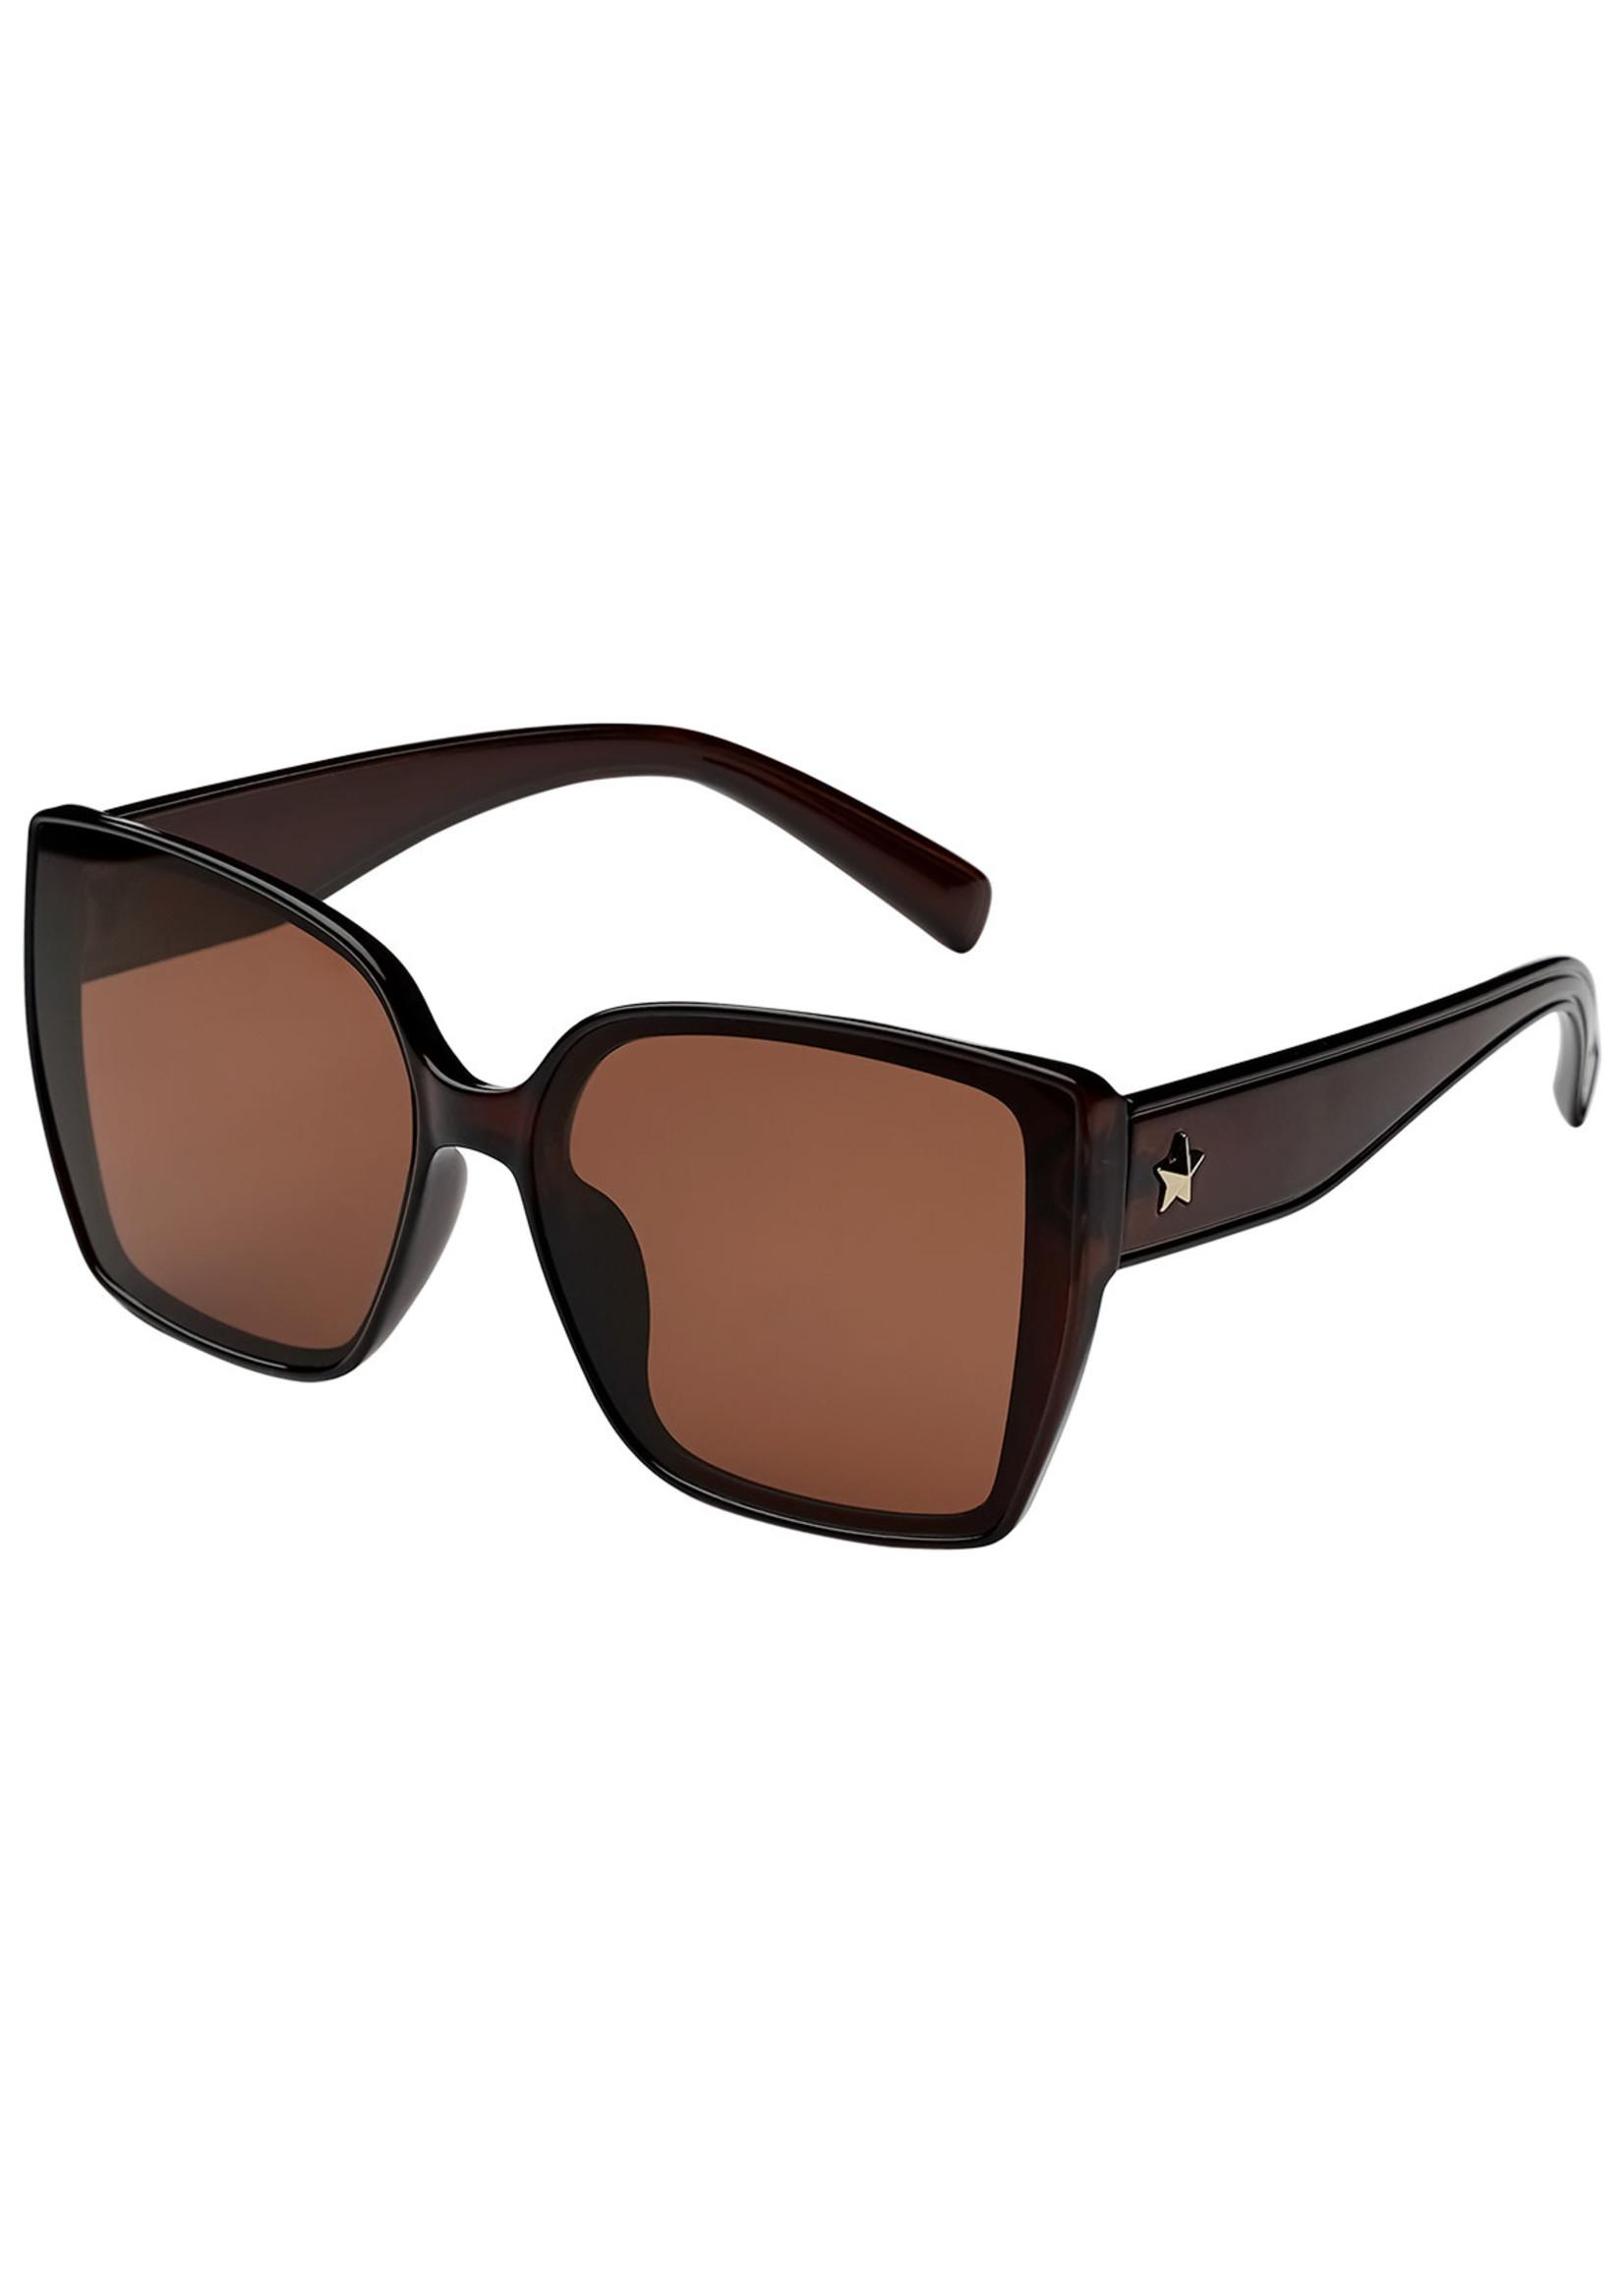 Ladybugs Vierkante zonnebril ster Camel